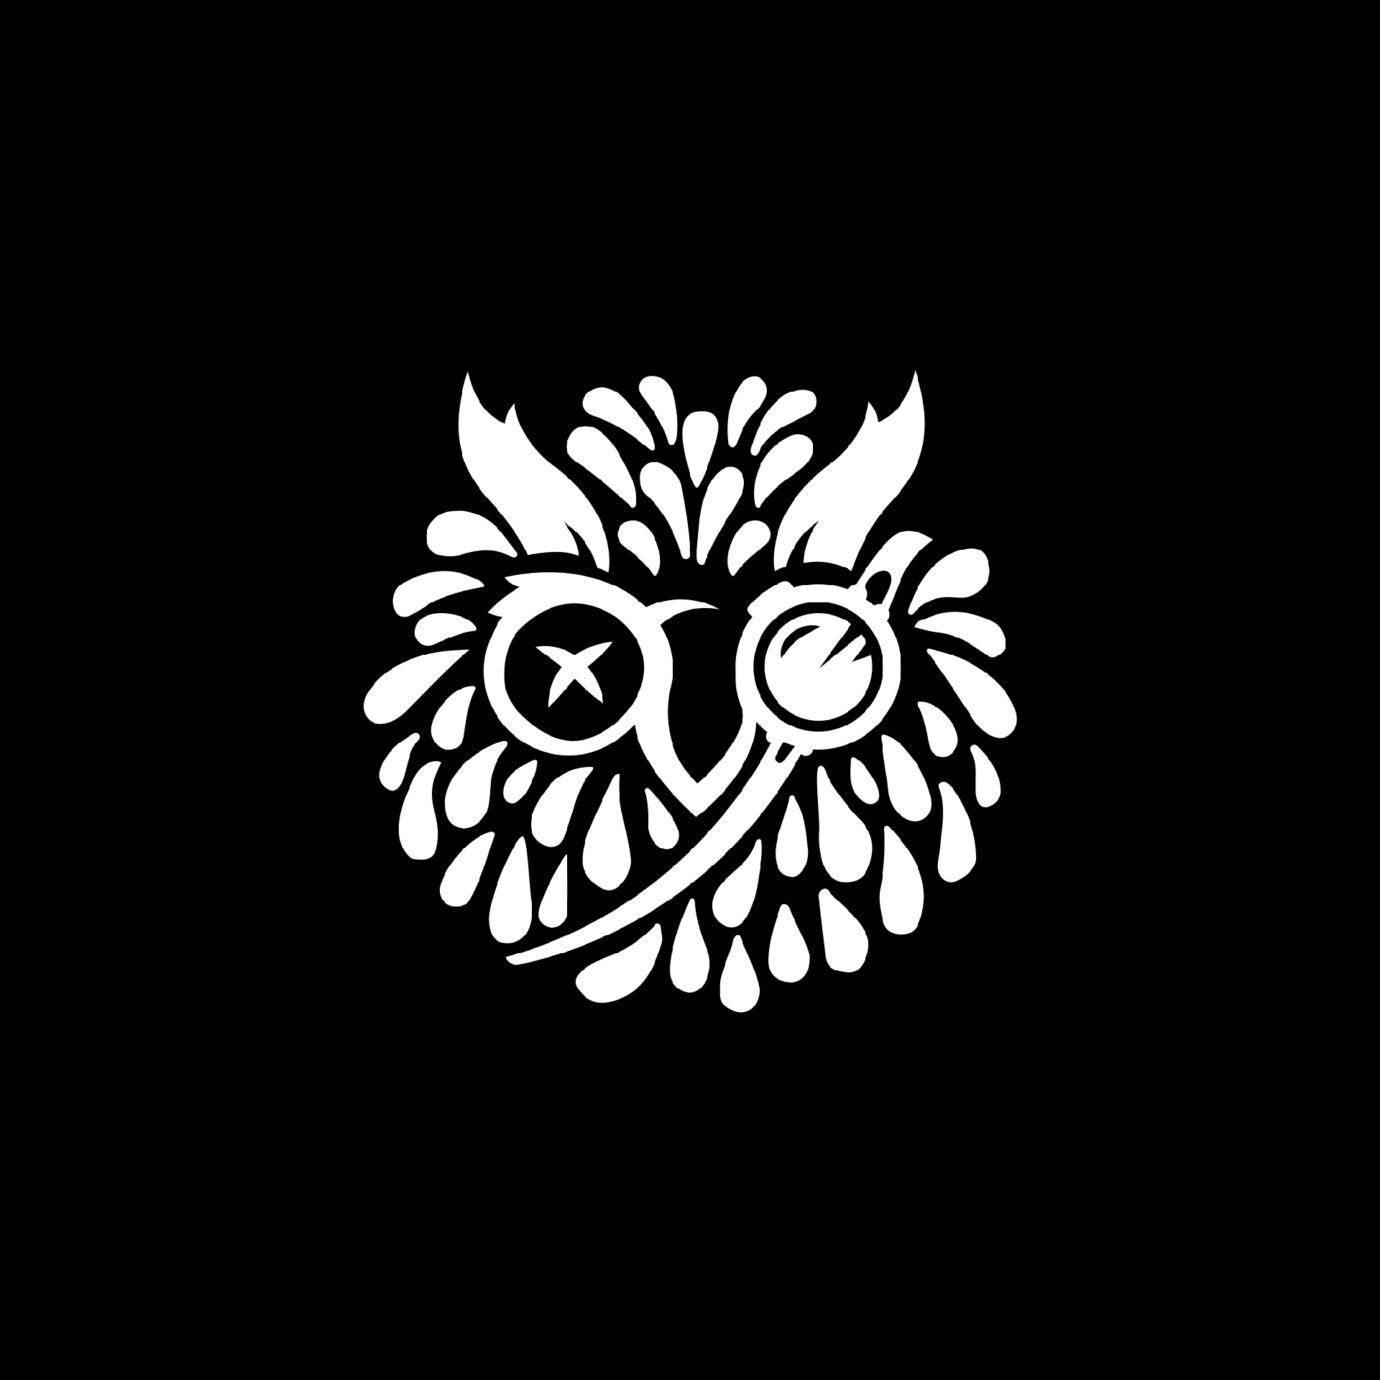 THE OWL 01 Milan Degraeve